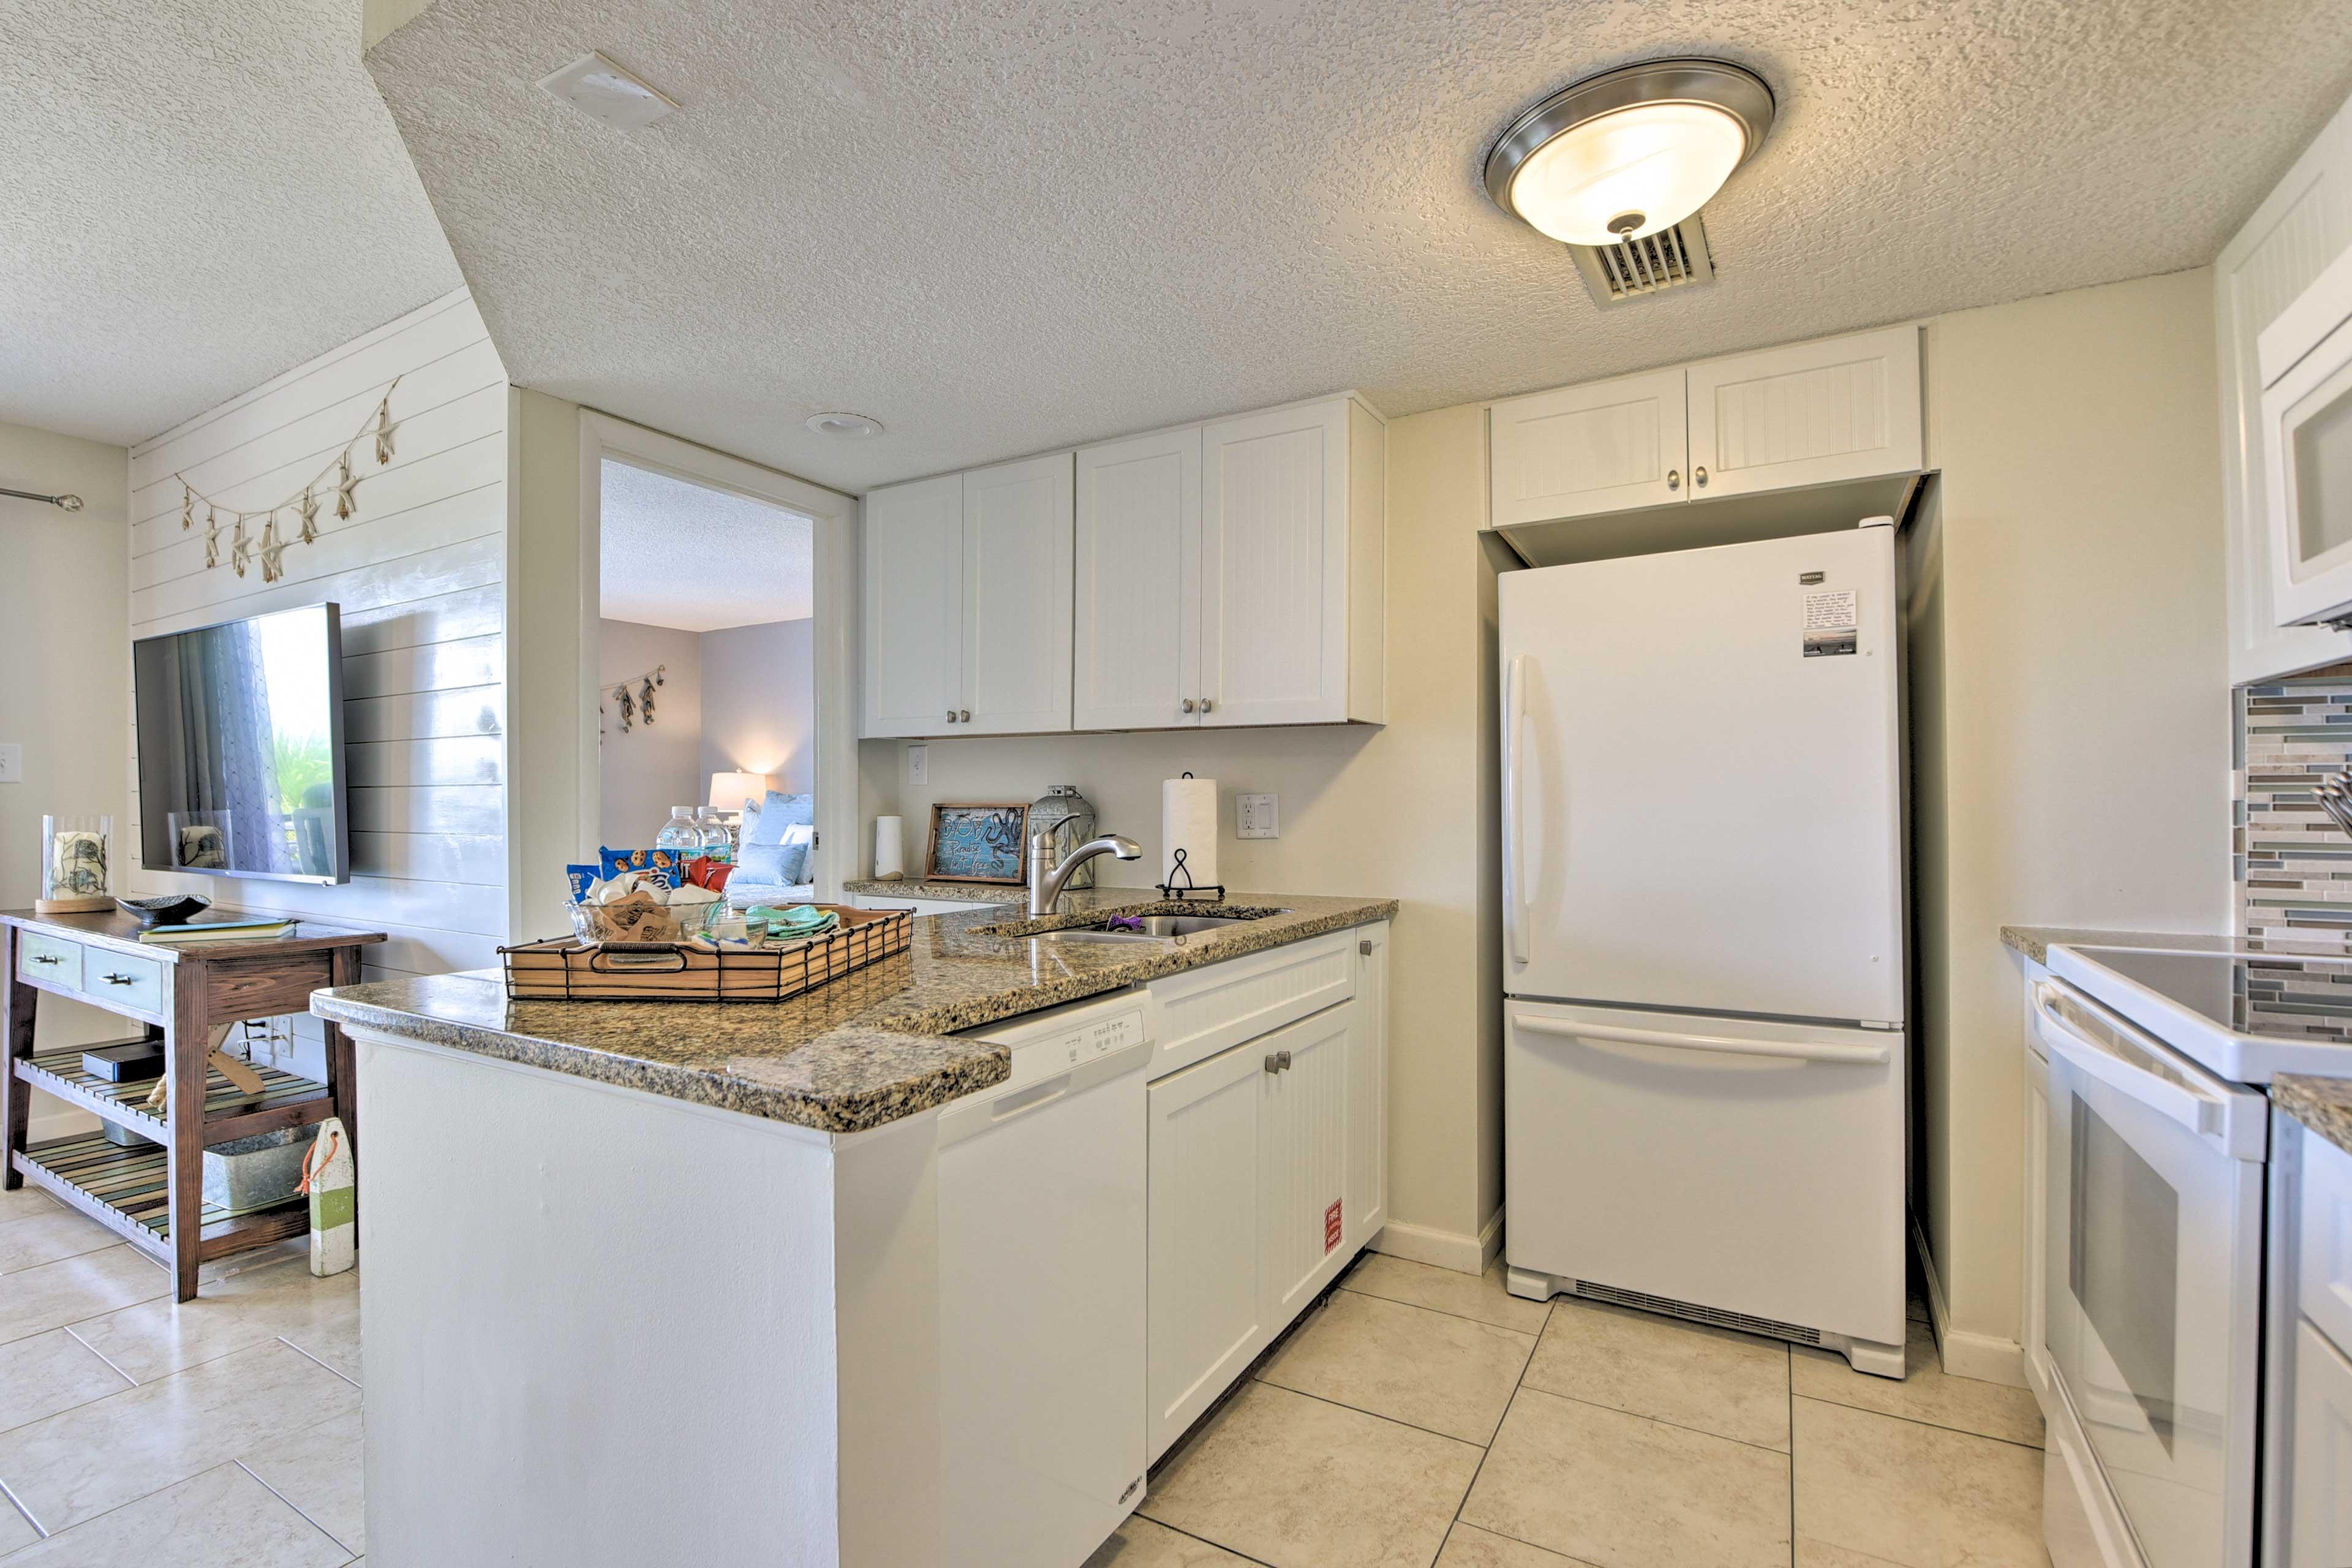 The full kitchen provides modern appliances.